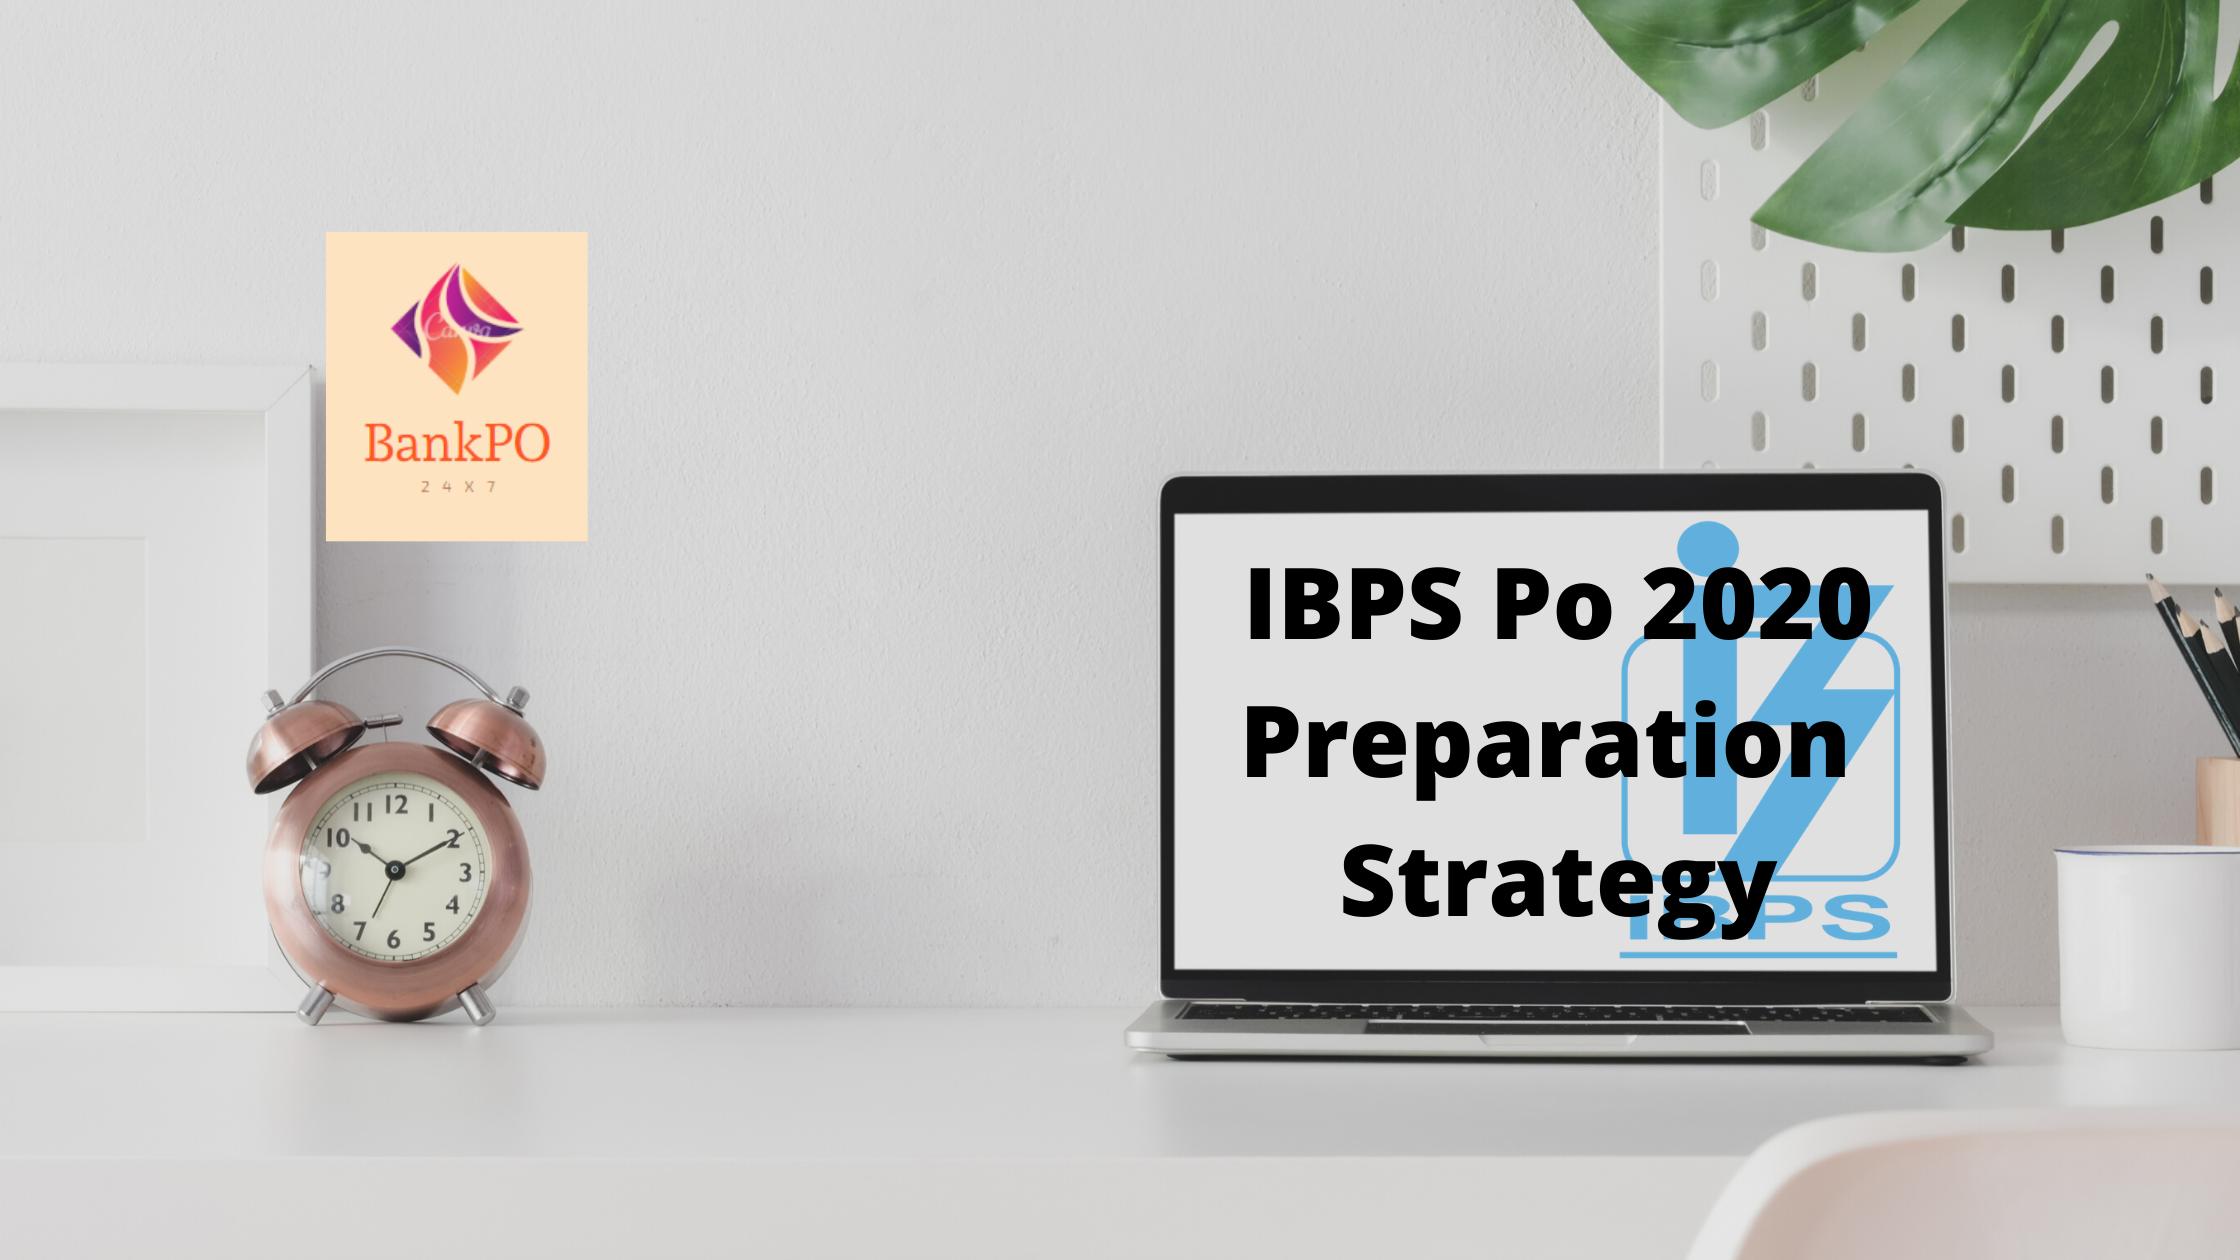 https://www.study24x7.com/article/1142/ibps-po-2020-p...